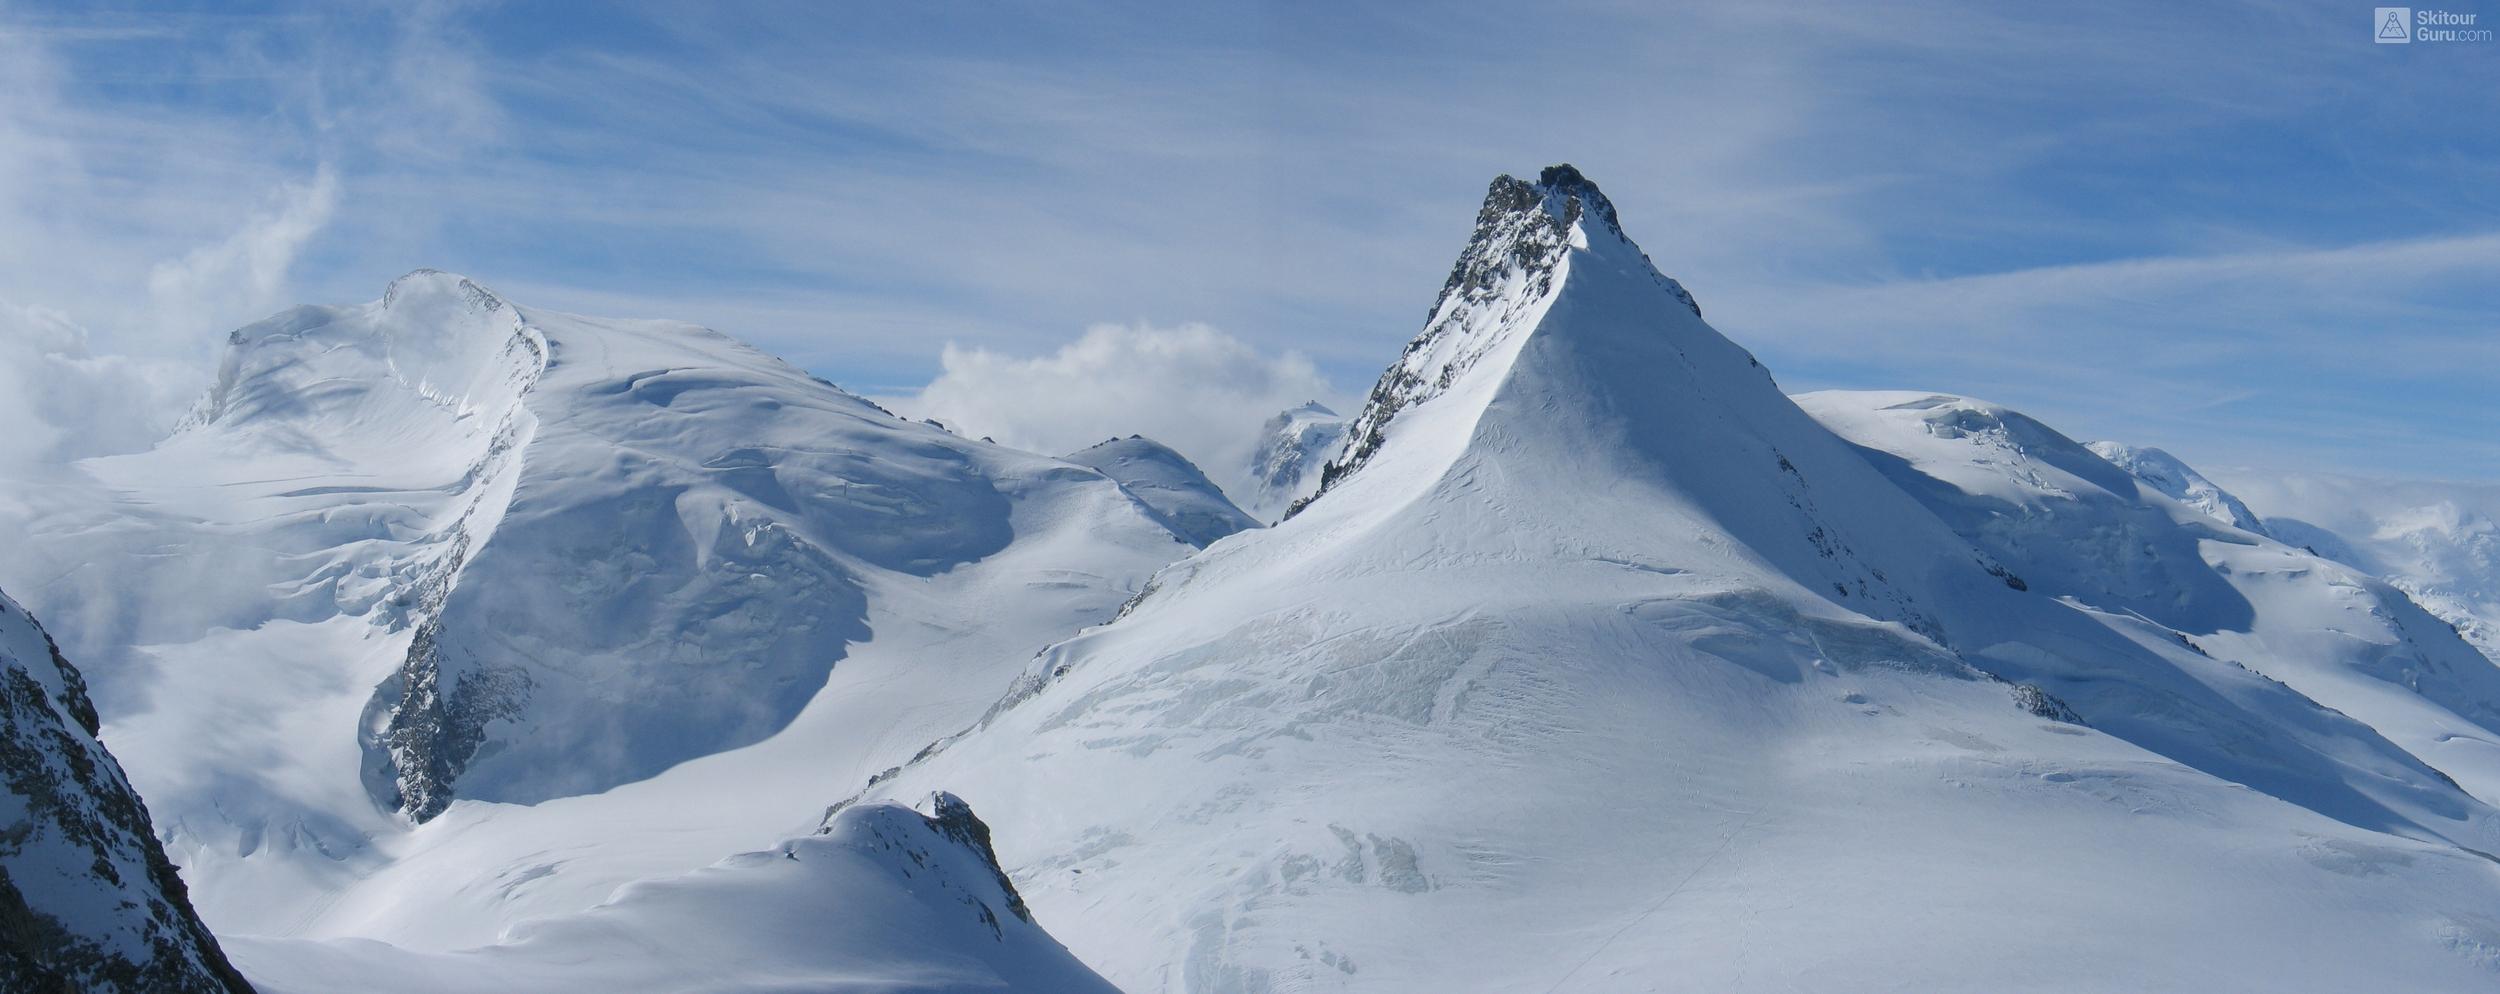 Allalinhorn Walliser Alpen / Alpes valaisannes Švýcarsko panorama 21